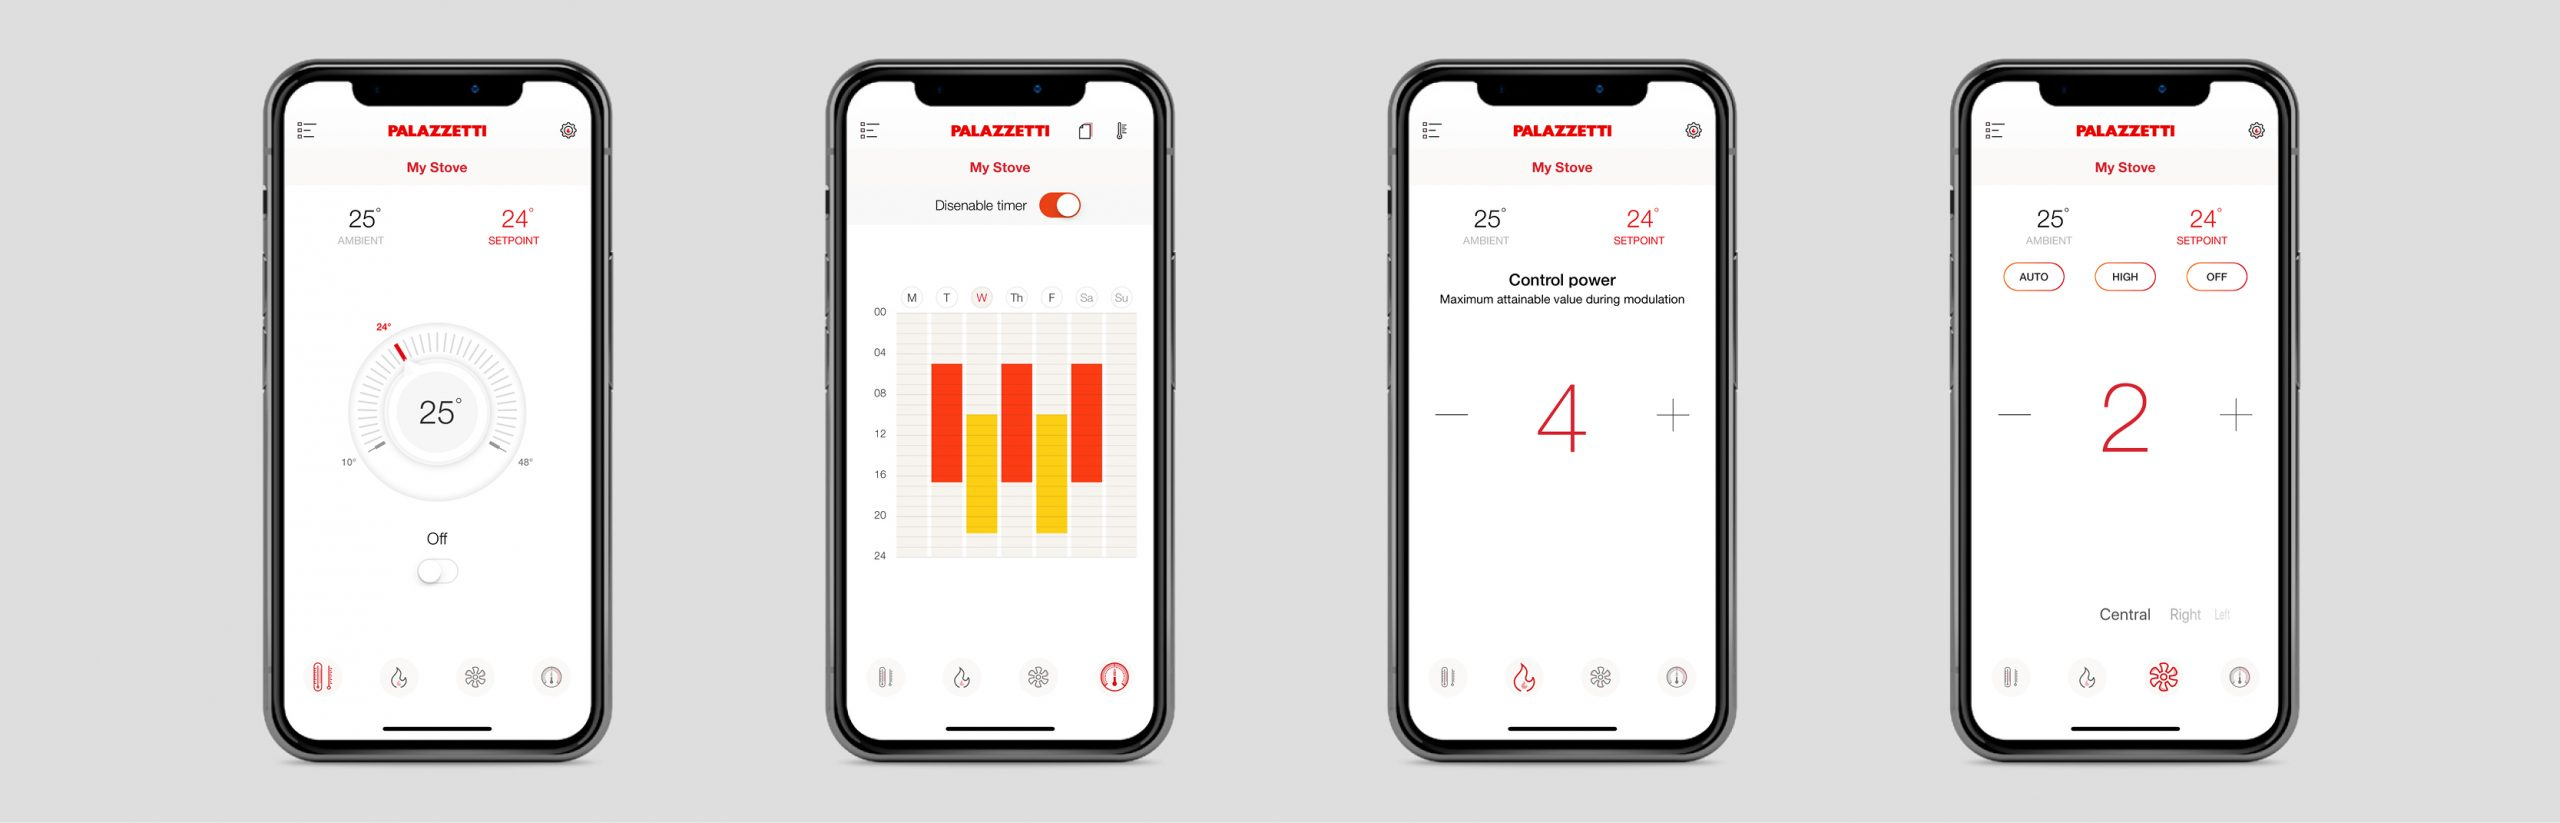 palazzetti-app-6